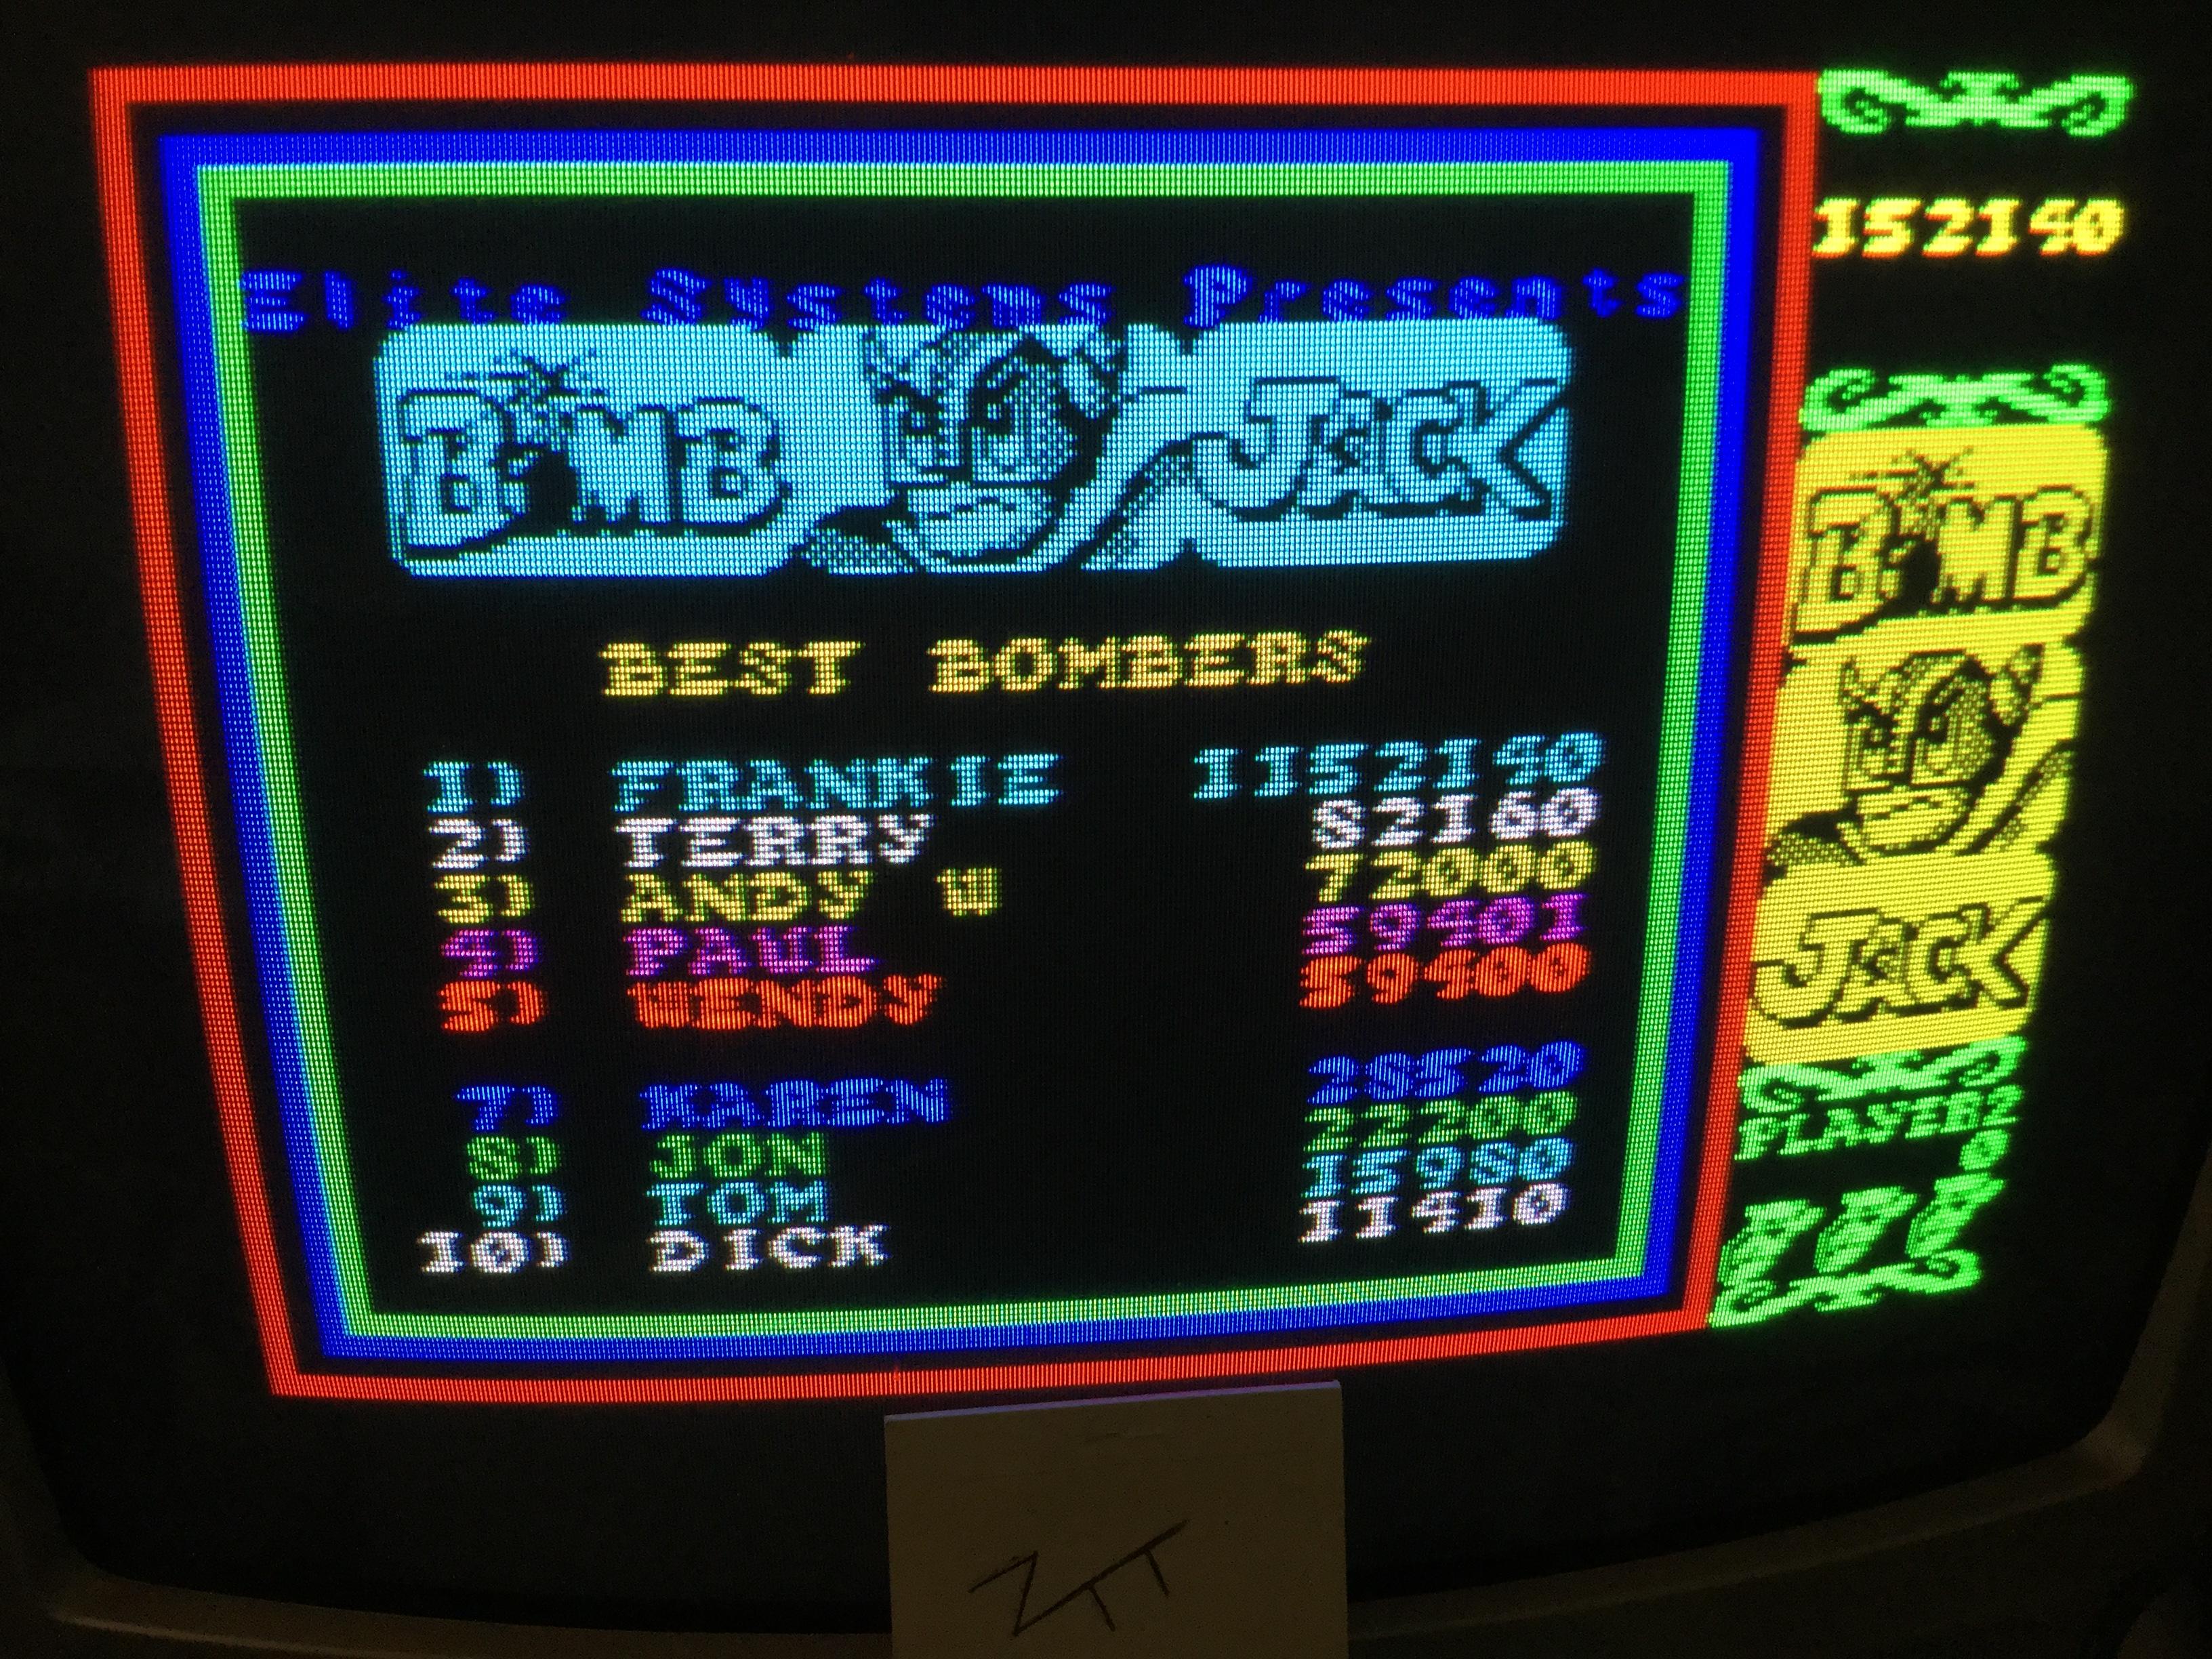 Frankie: Bomb Jack (ZX Spectrum) 1,152,140 points on 2018-09-19 11:49:36